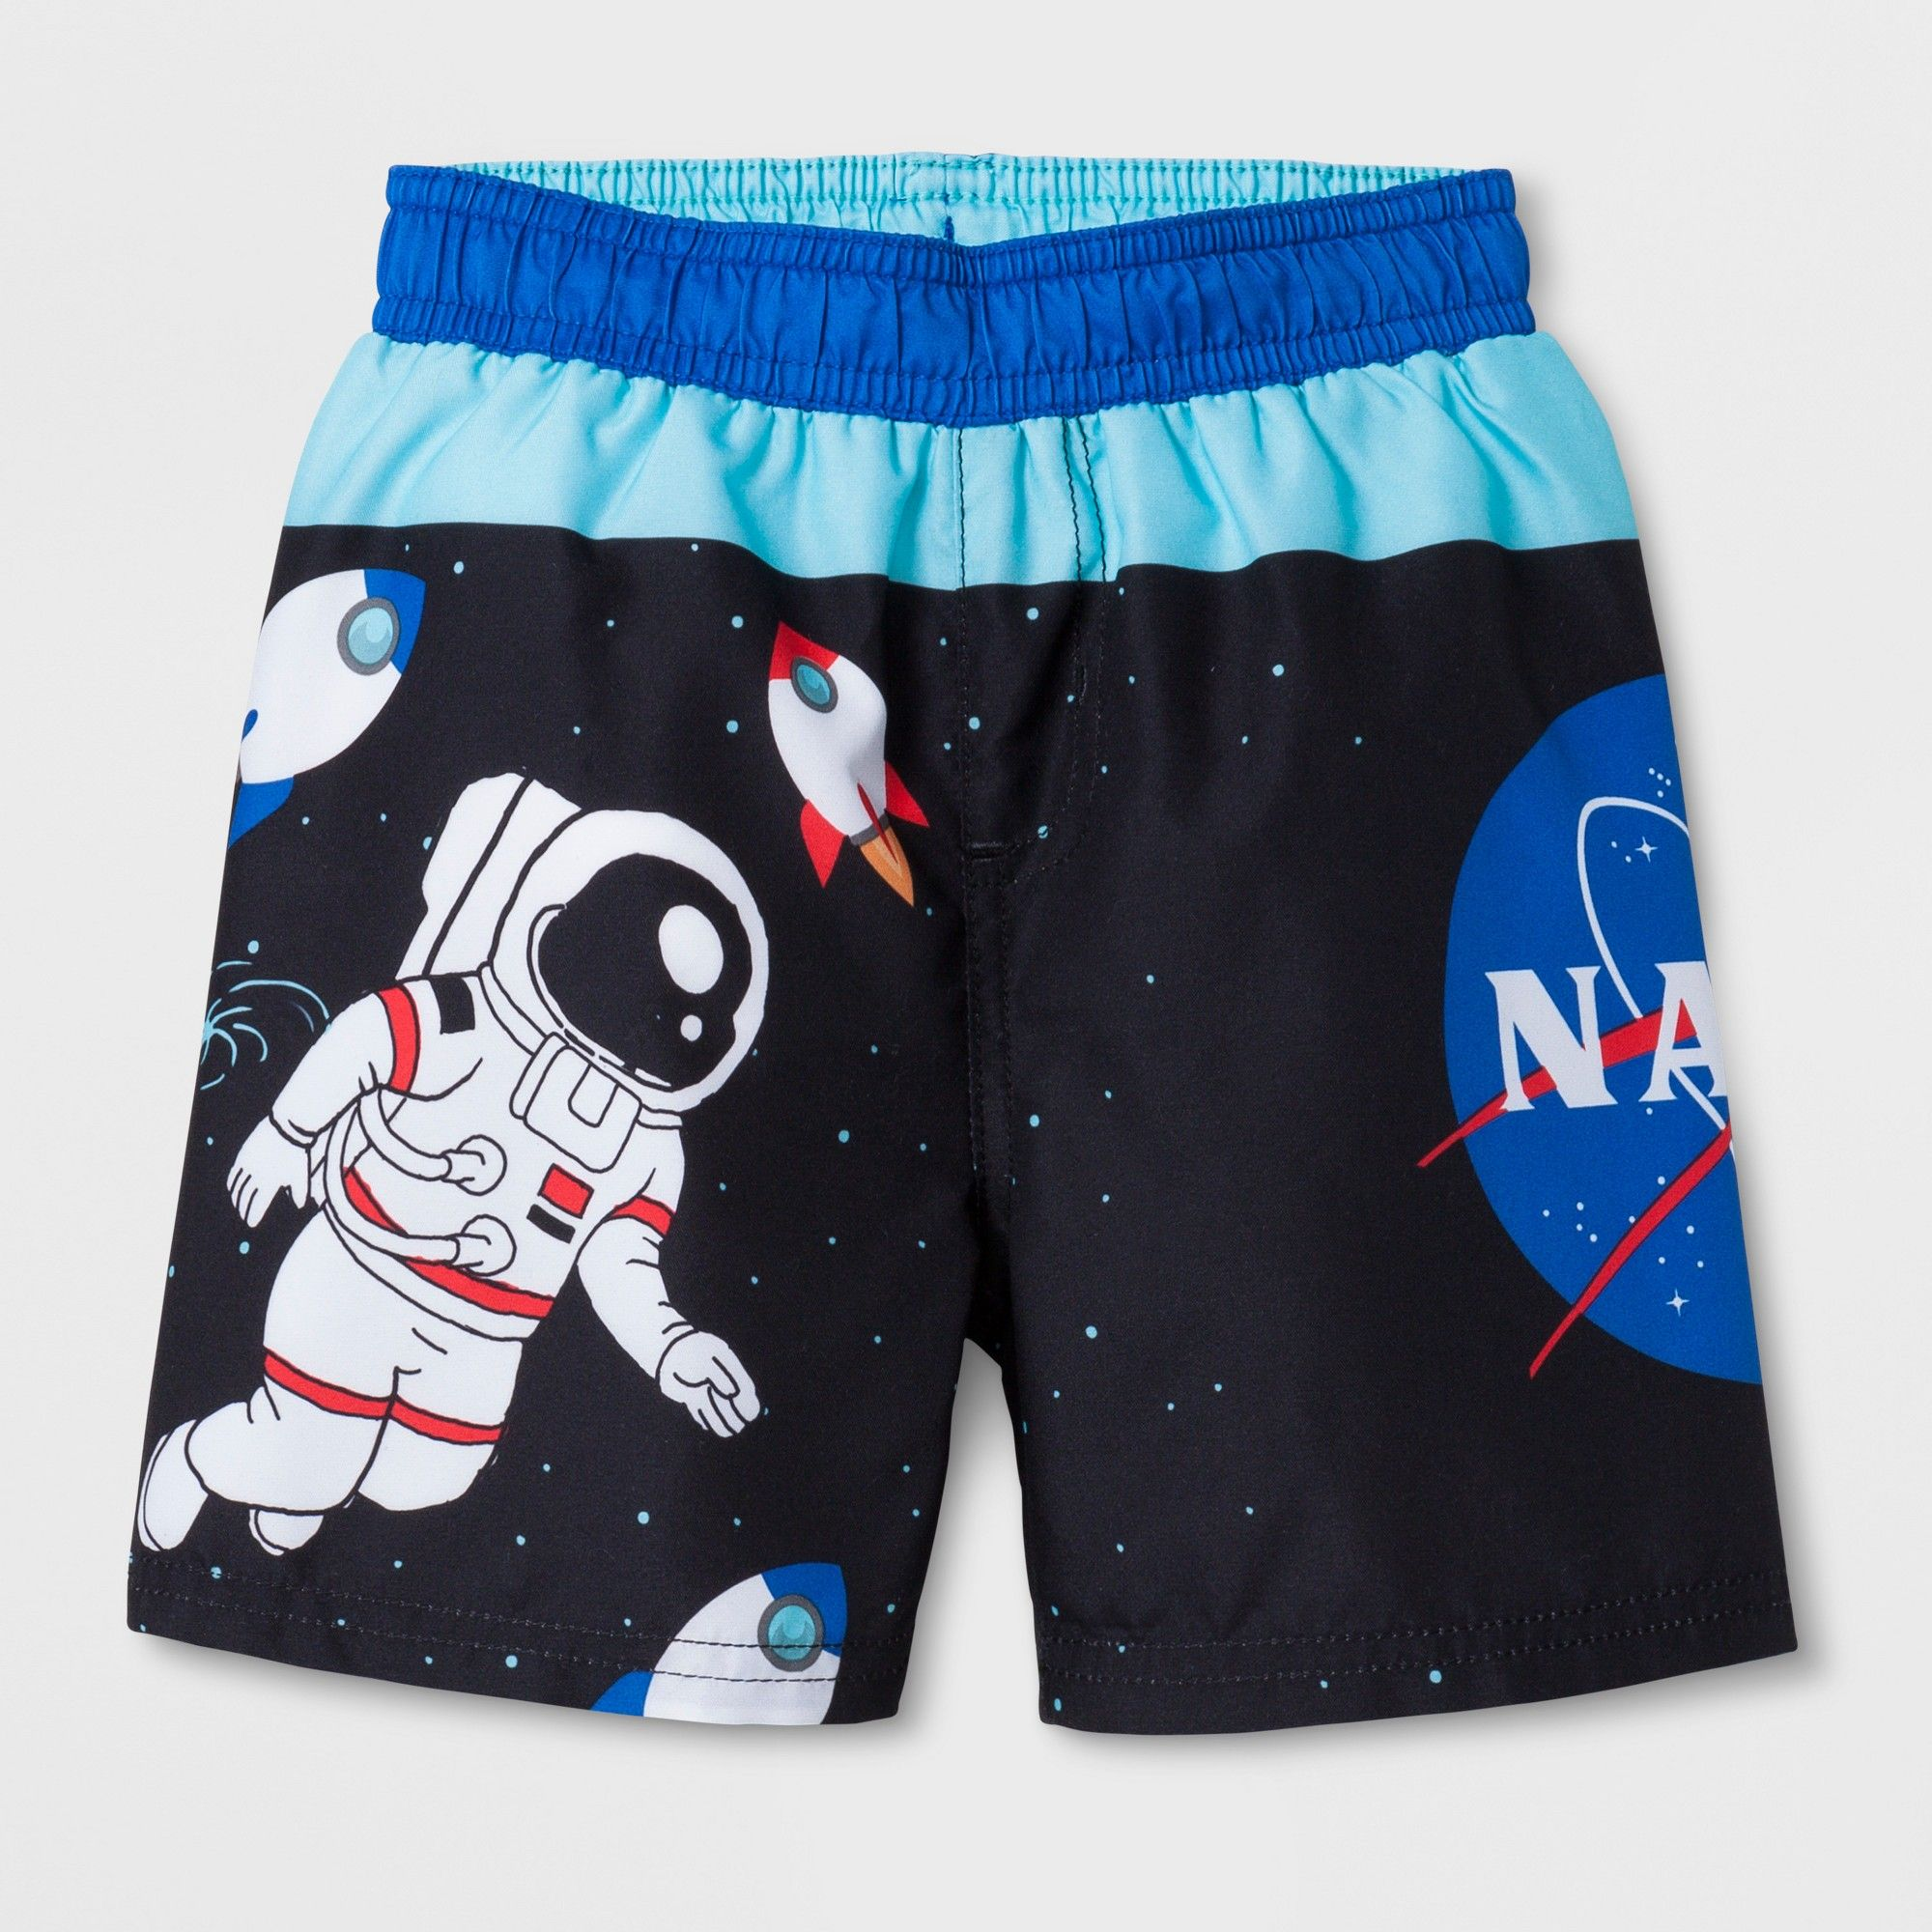 16ae3d7057 Toddler Boys' Nasa Swim Trunks - Black 3T | Products | Swim trunks ...